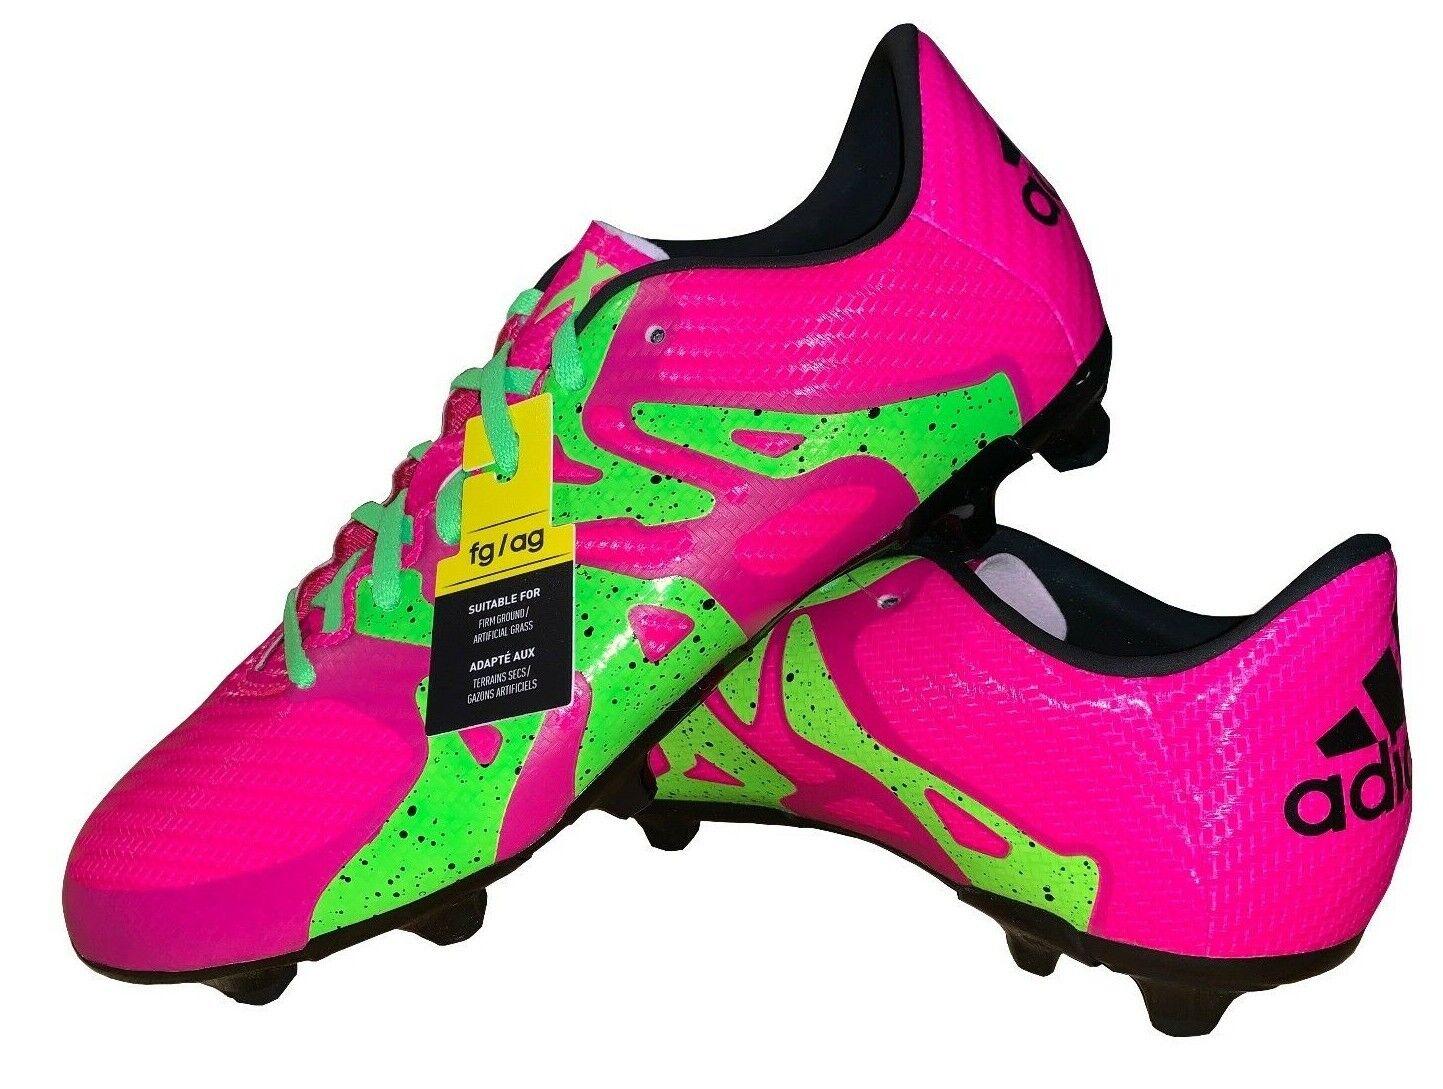 6ac1e5d0e89b42 Vergleich Schuhe Test Fussball Kinder Adidas POXkZui